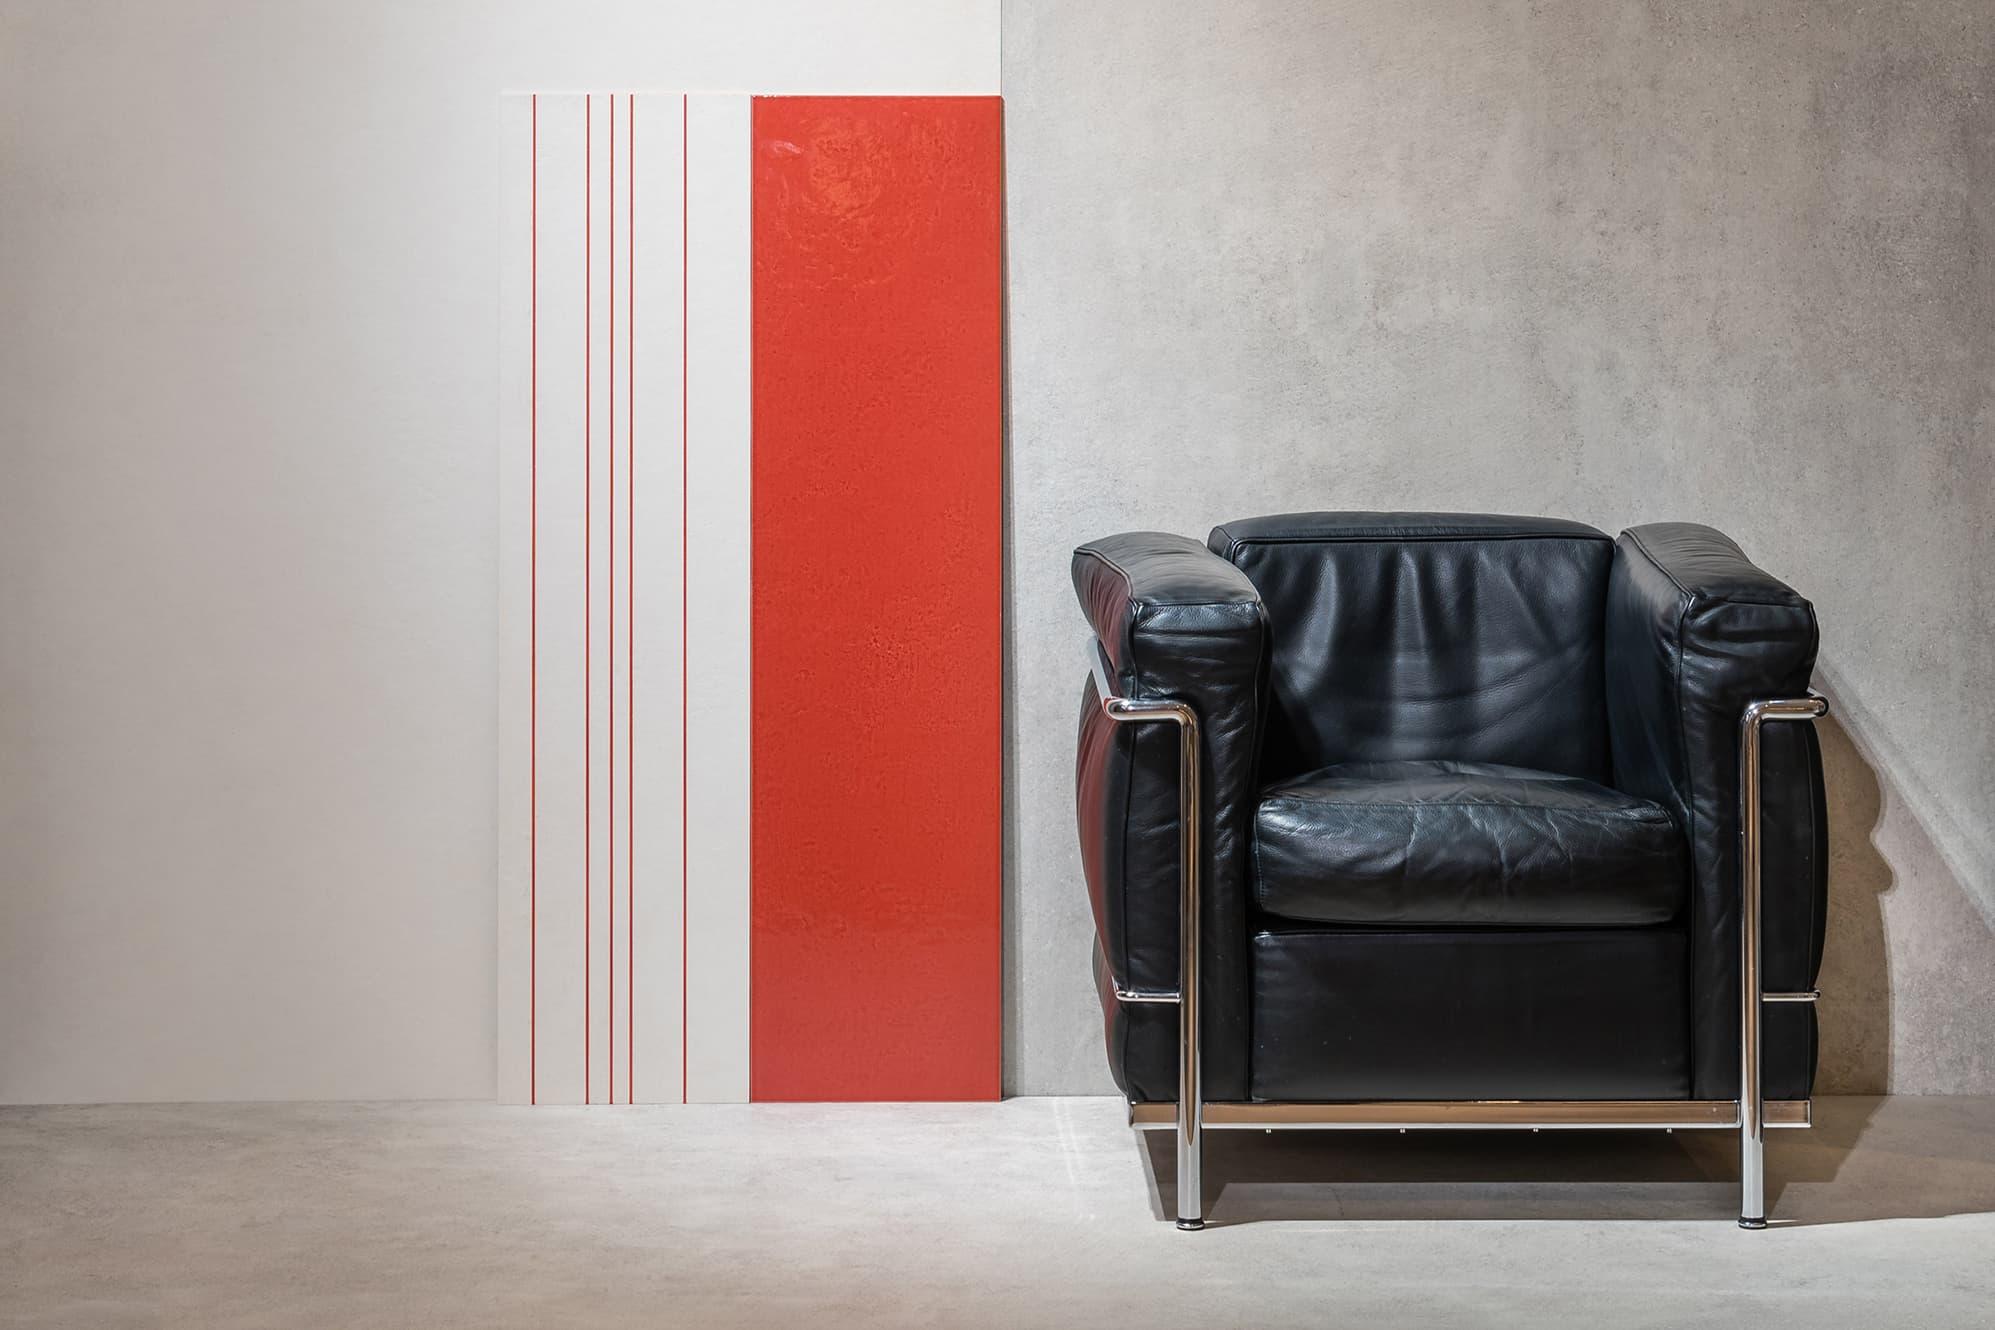 Gigacer Releases Series of Le Corbusier-Inspired Ceramics Wall Tiles for Milan Design Week